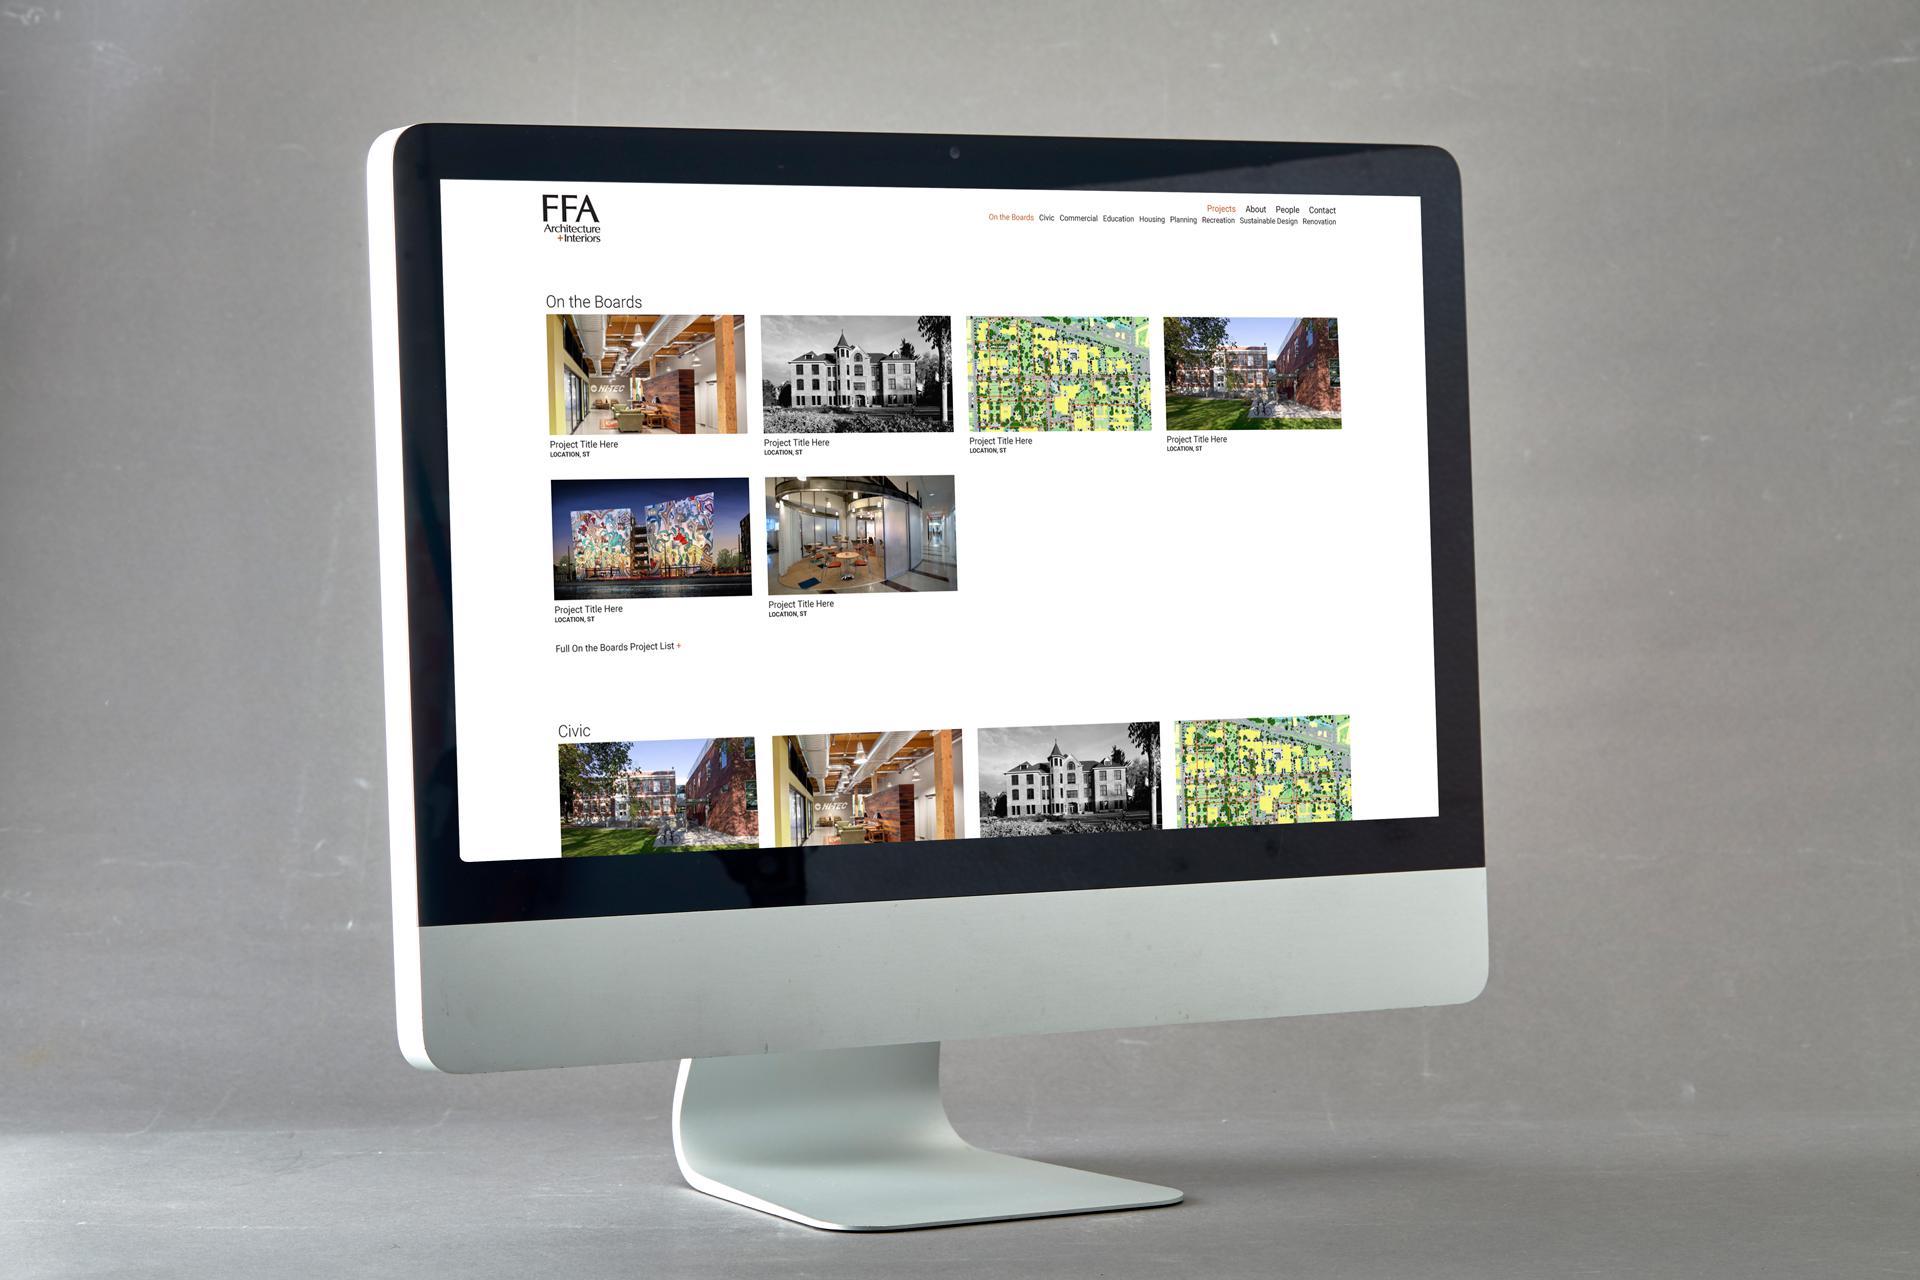 FFAwebsite3.jpg